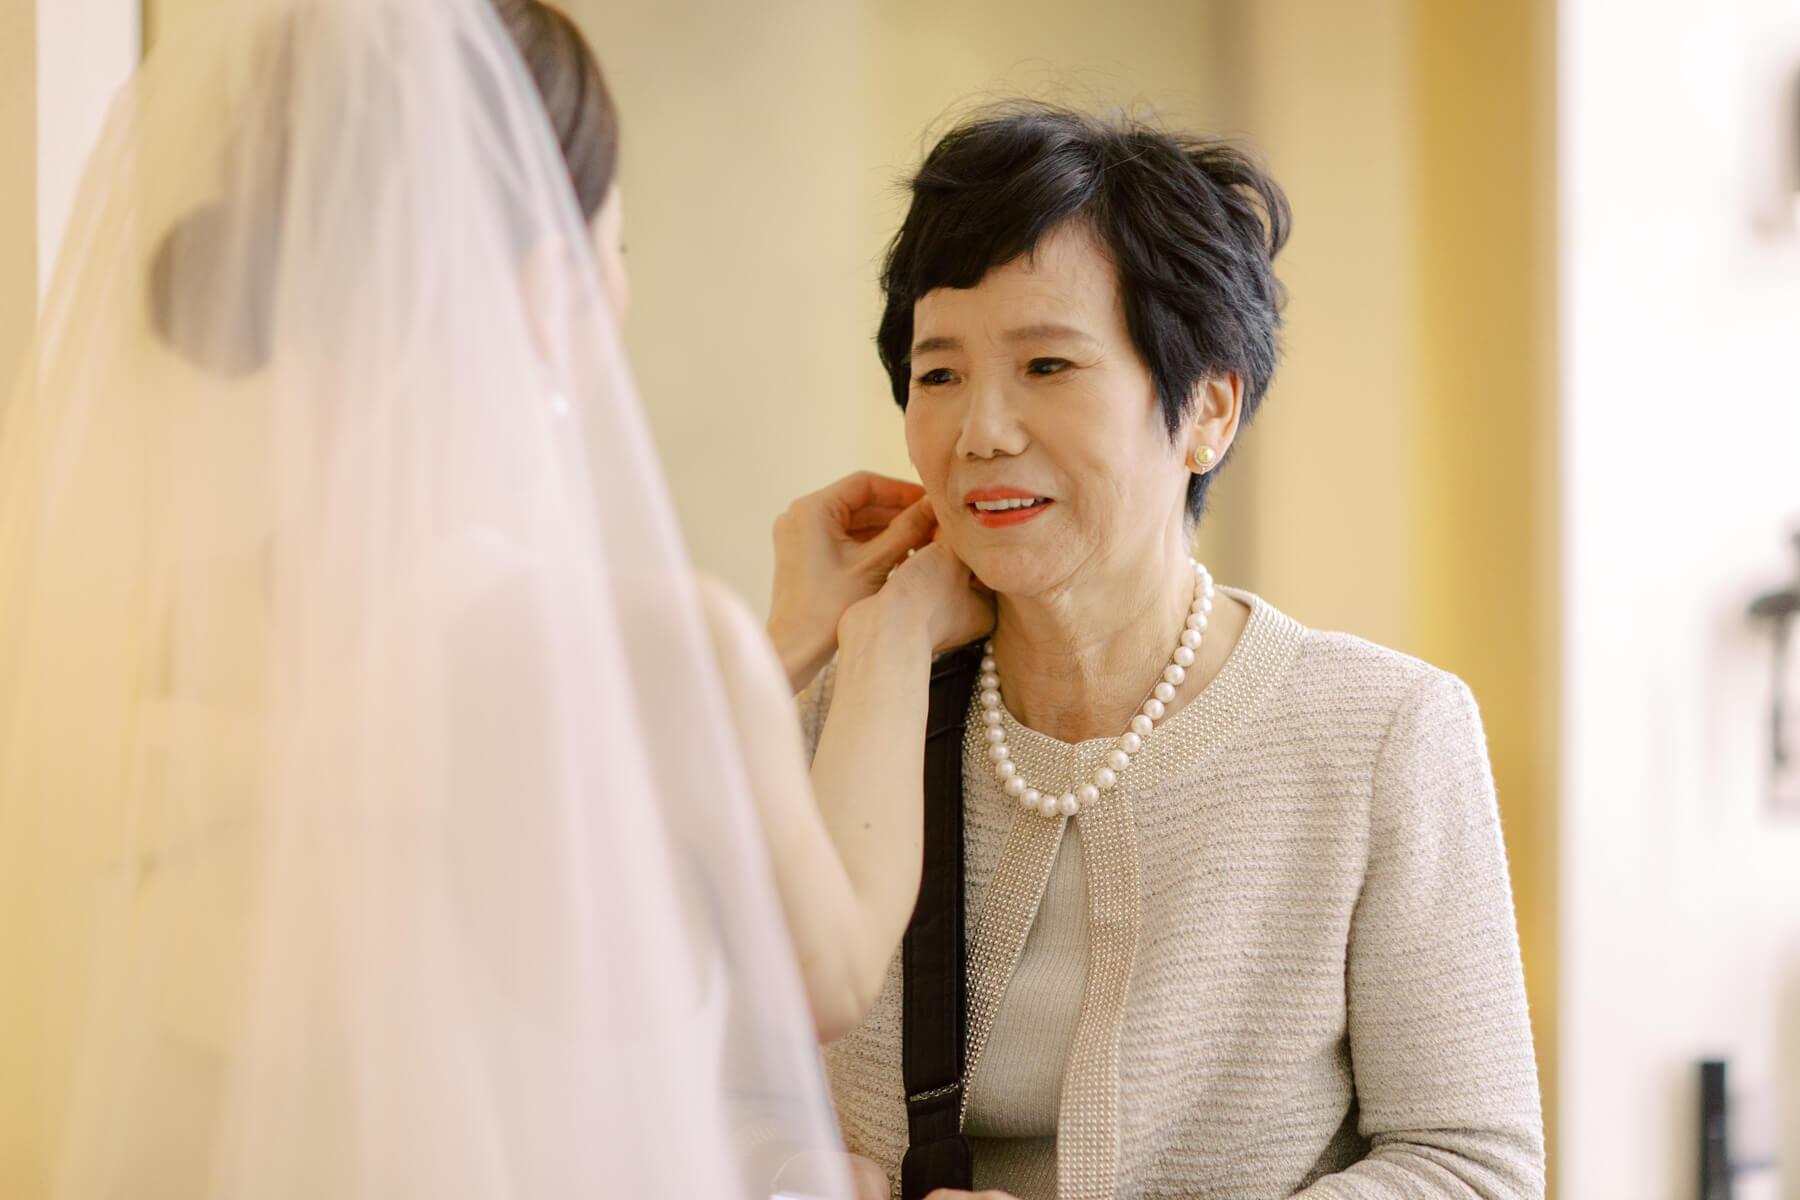 nikkiloveu-hongkong-weddingday-theupperhouse-as-008.jpg